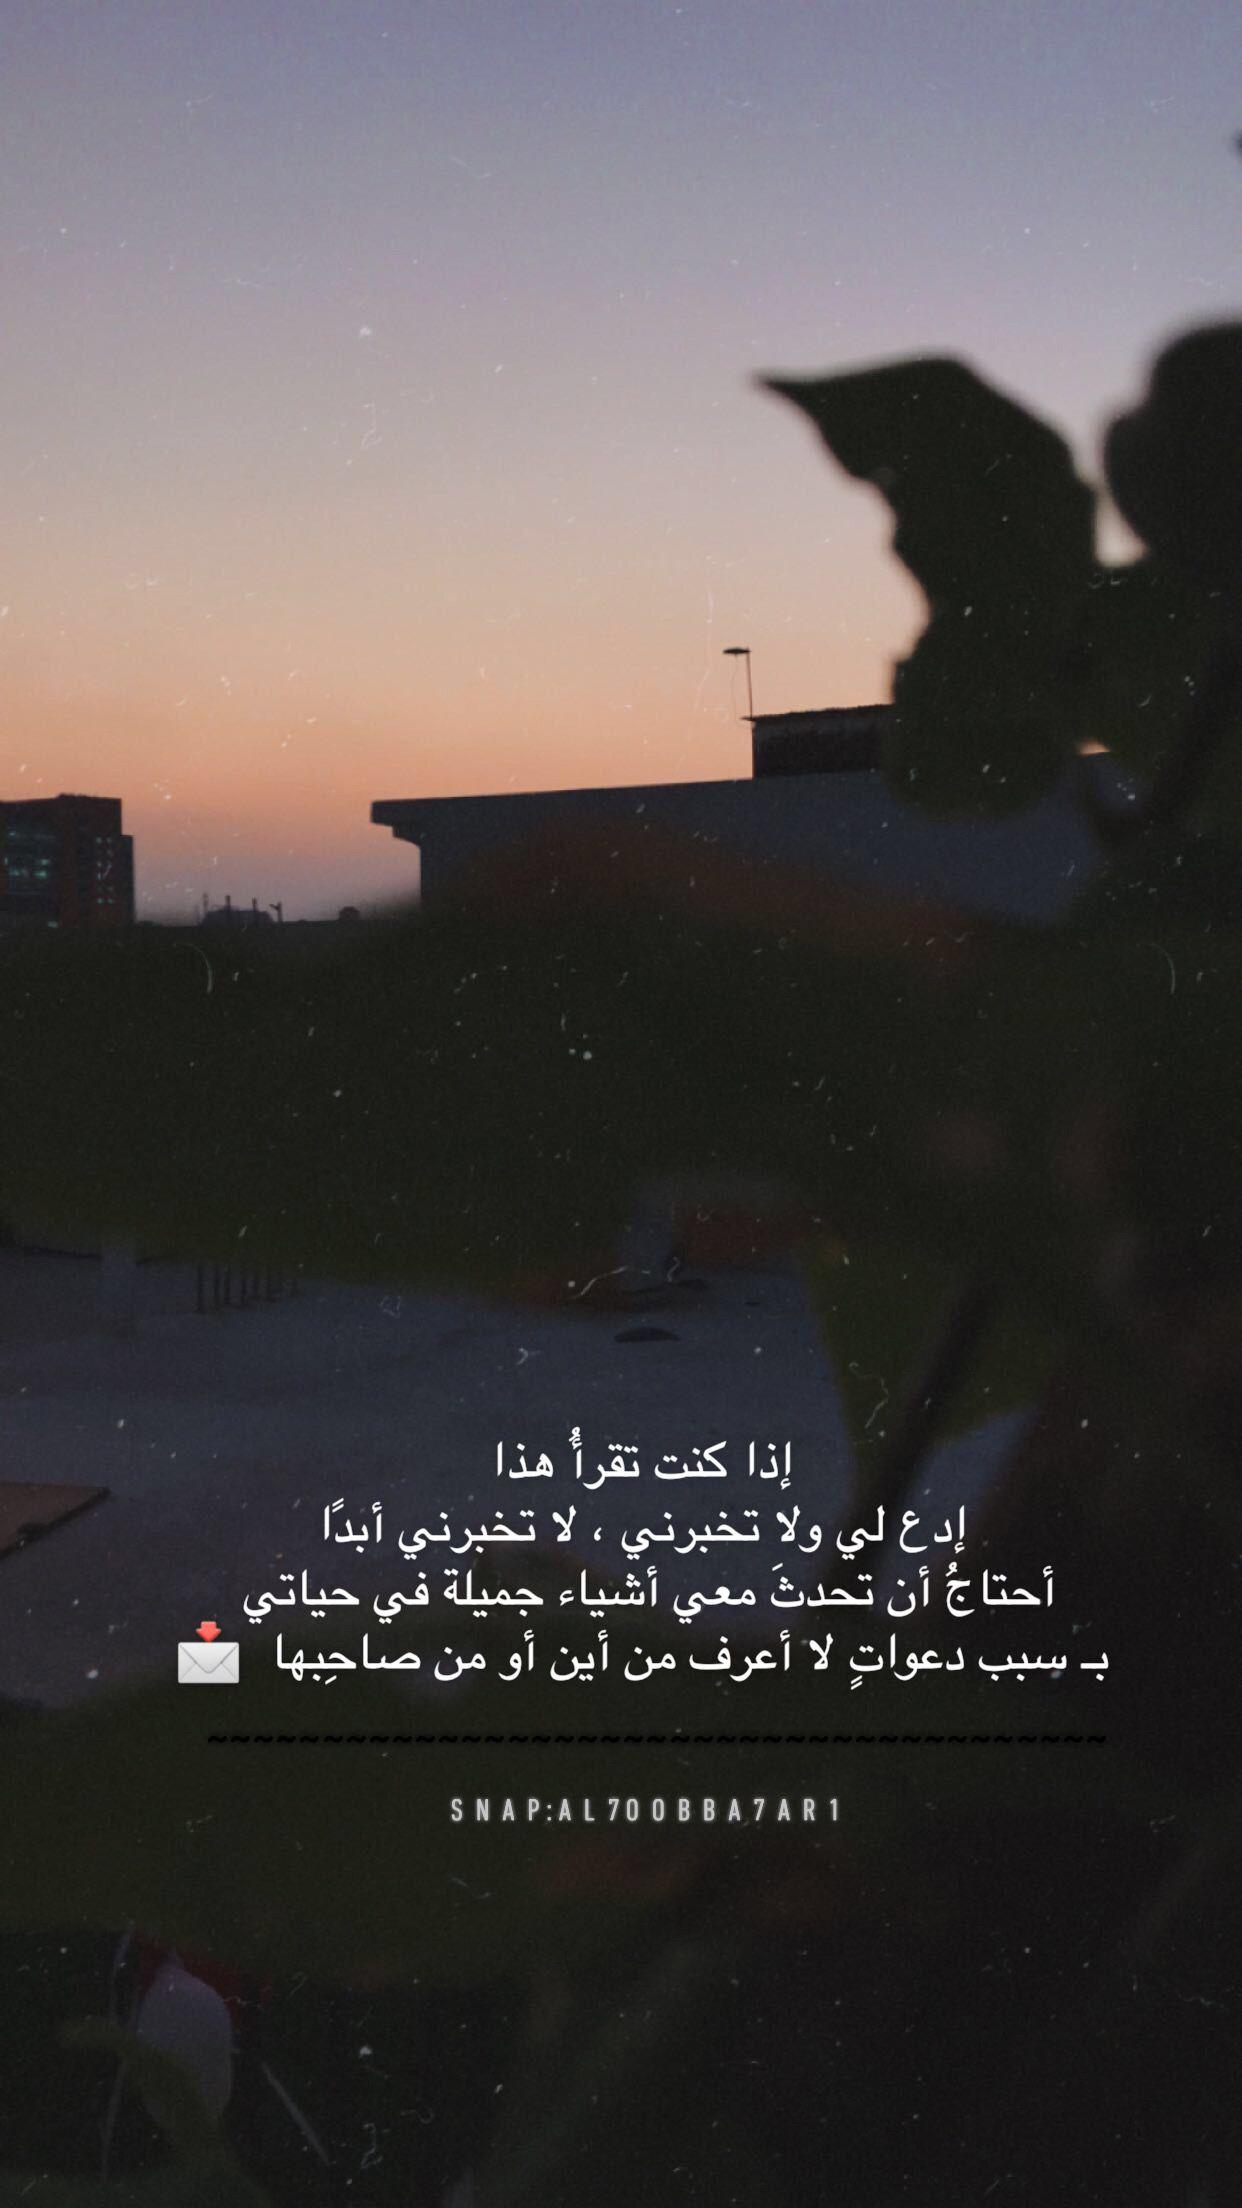 Snap Al7oobba7ar1 Arabic Tattoo Quotes Sea Quotes Arabic Quotes